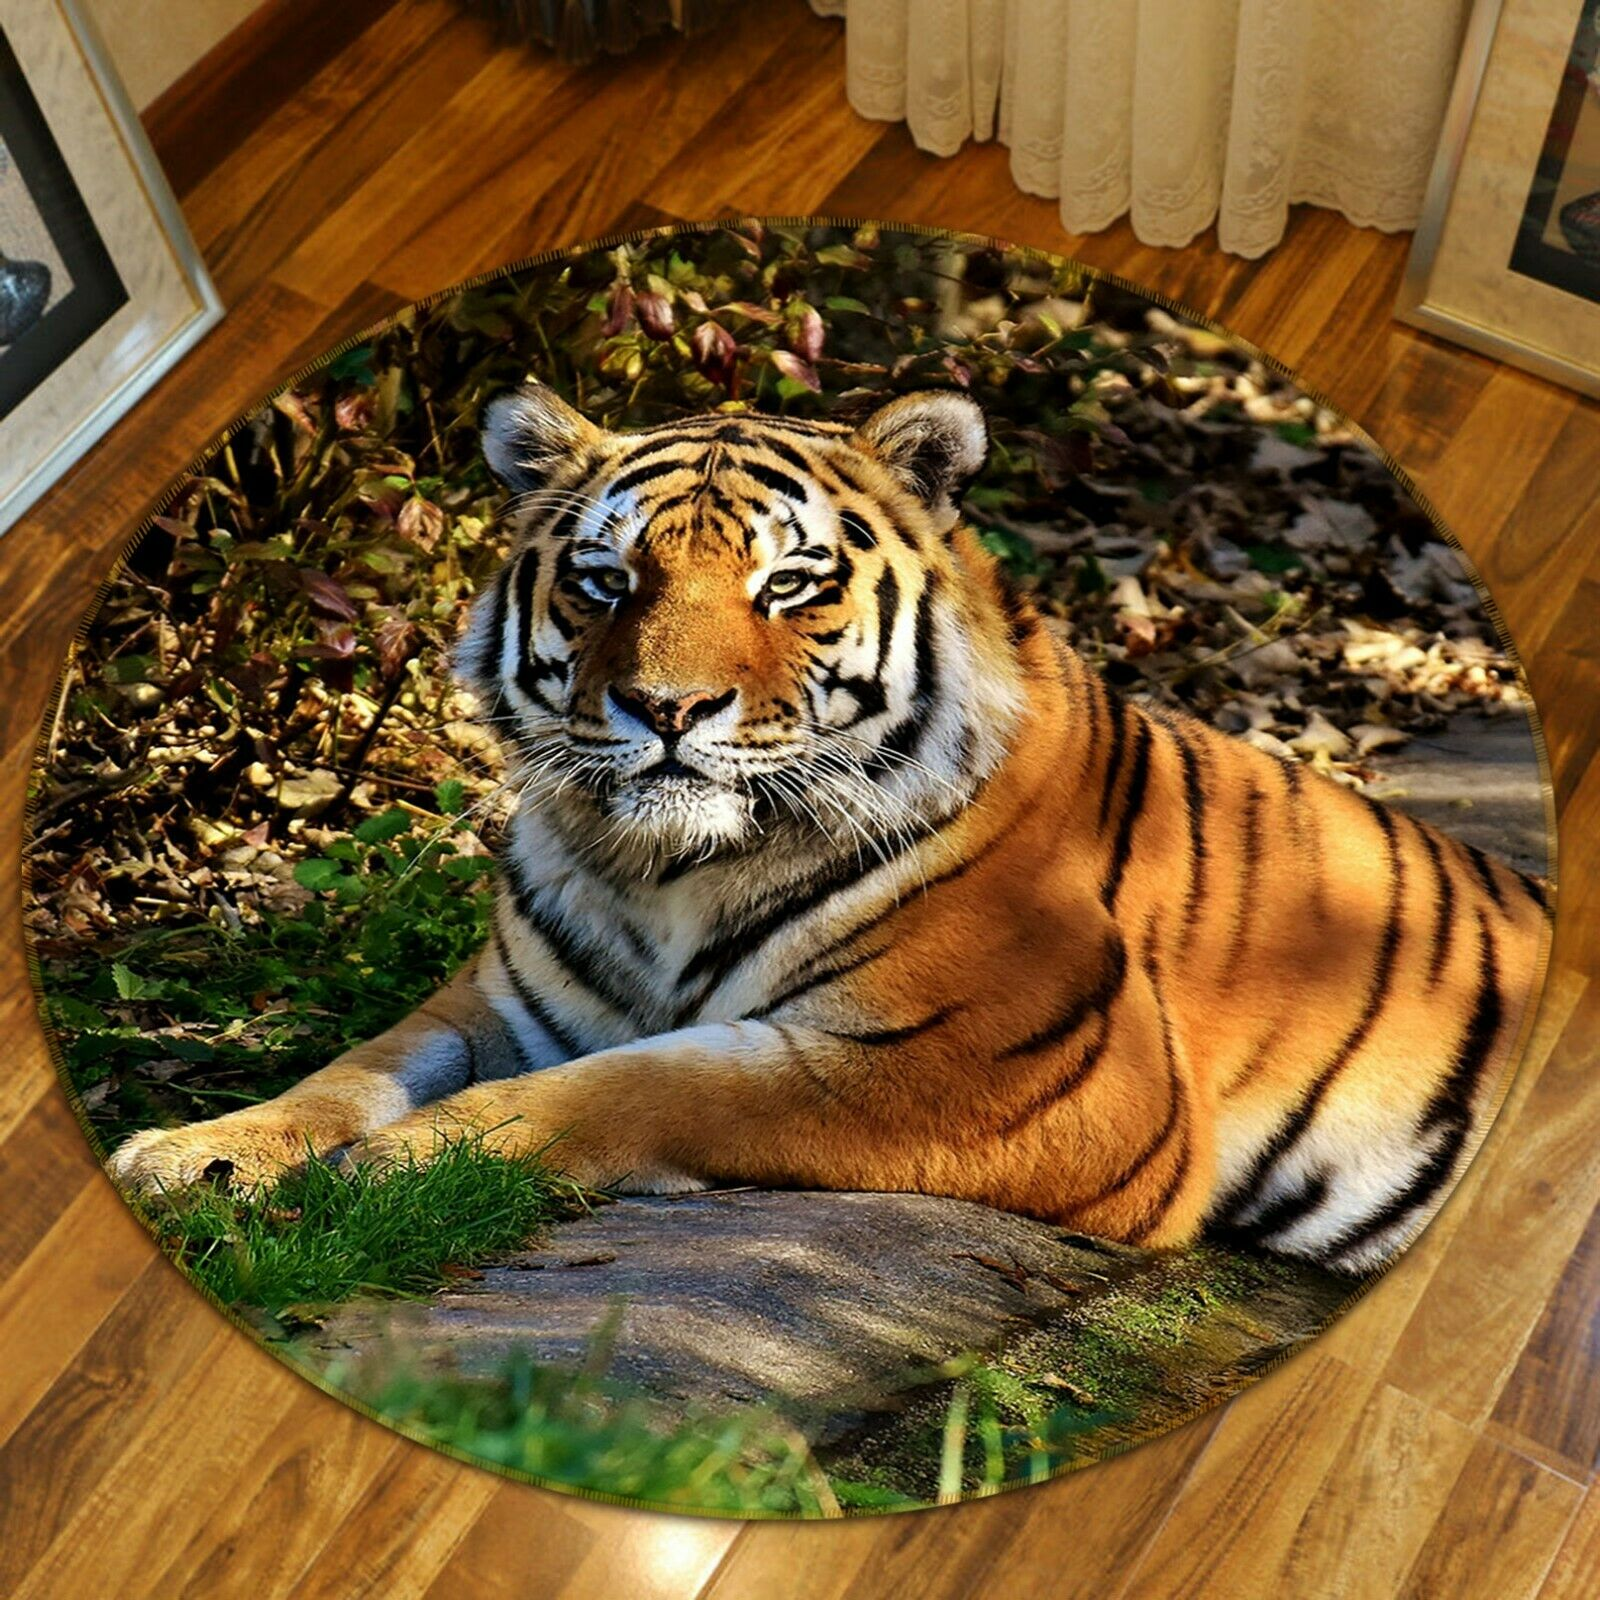 3D TIGER STONE C90 Animale tappetino antiscivolo tappeto rossoondo elegante Tappeto Wendy